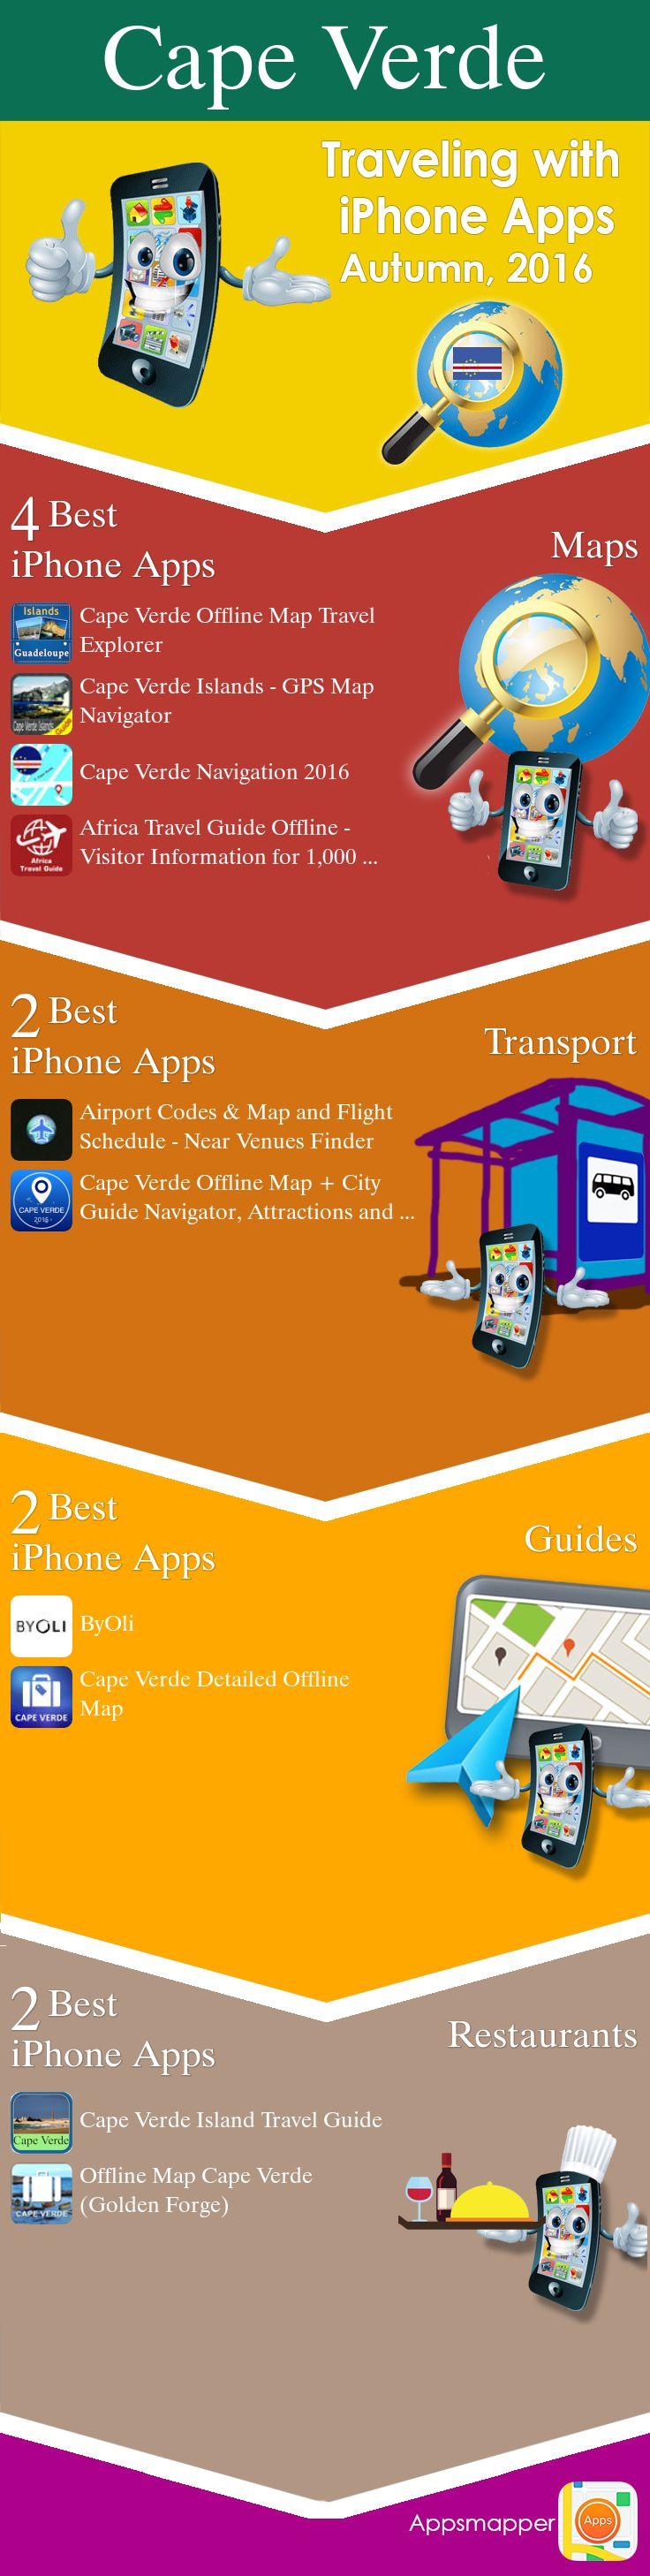 Political Map Of Senegal%0A Cape Verde iPhone apps  Travel Guides  Maps  Transportation  Biking   Museums